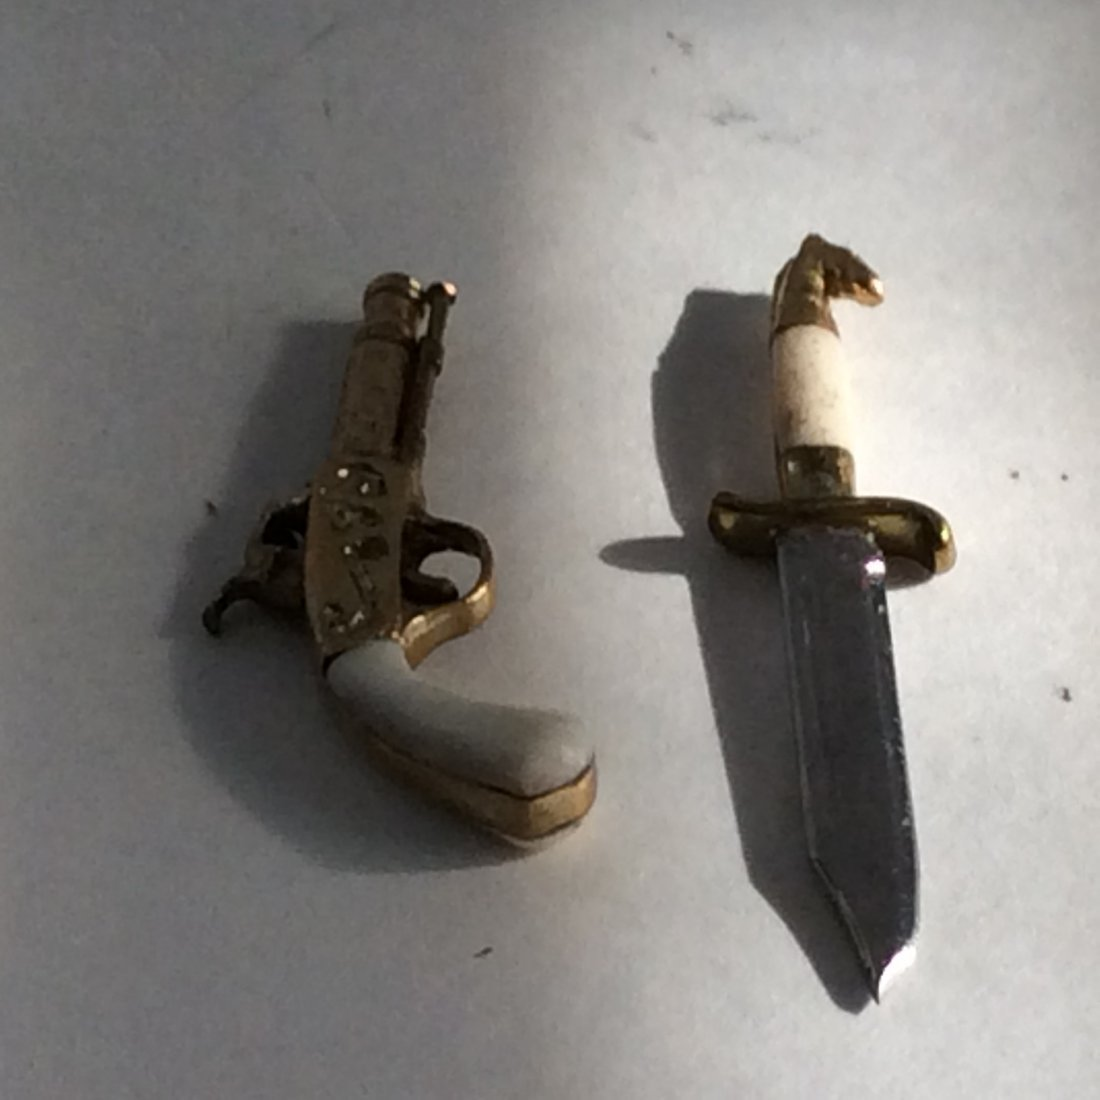 Antique 14k Miniature Percussion Pistol and Dagger - 3